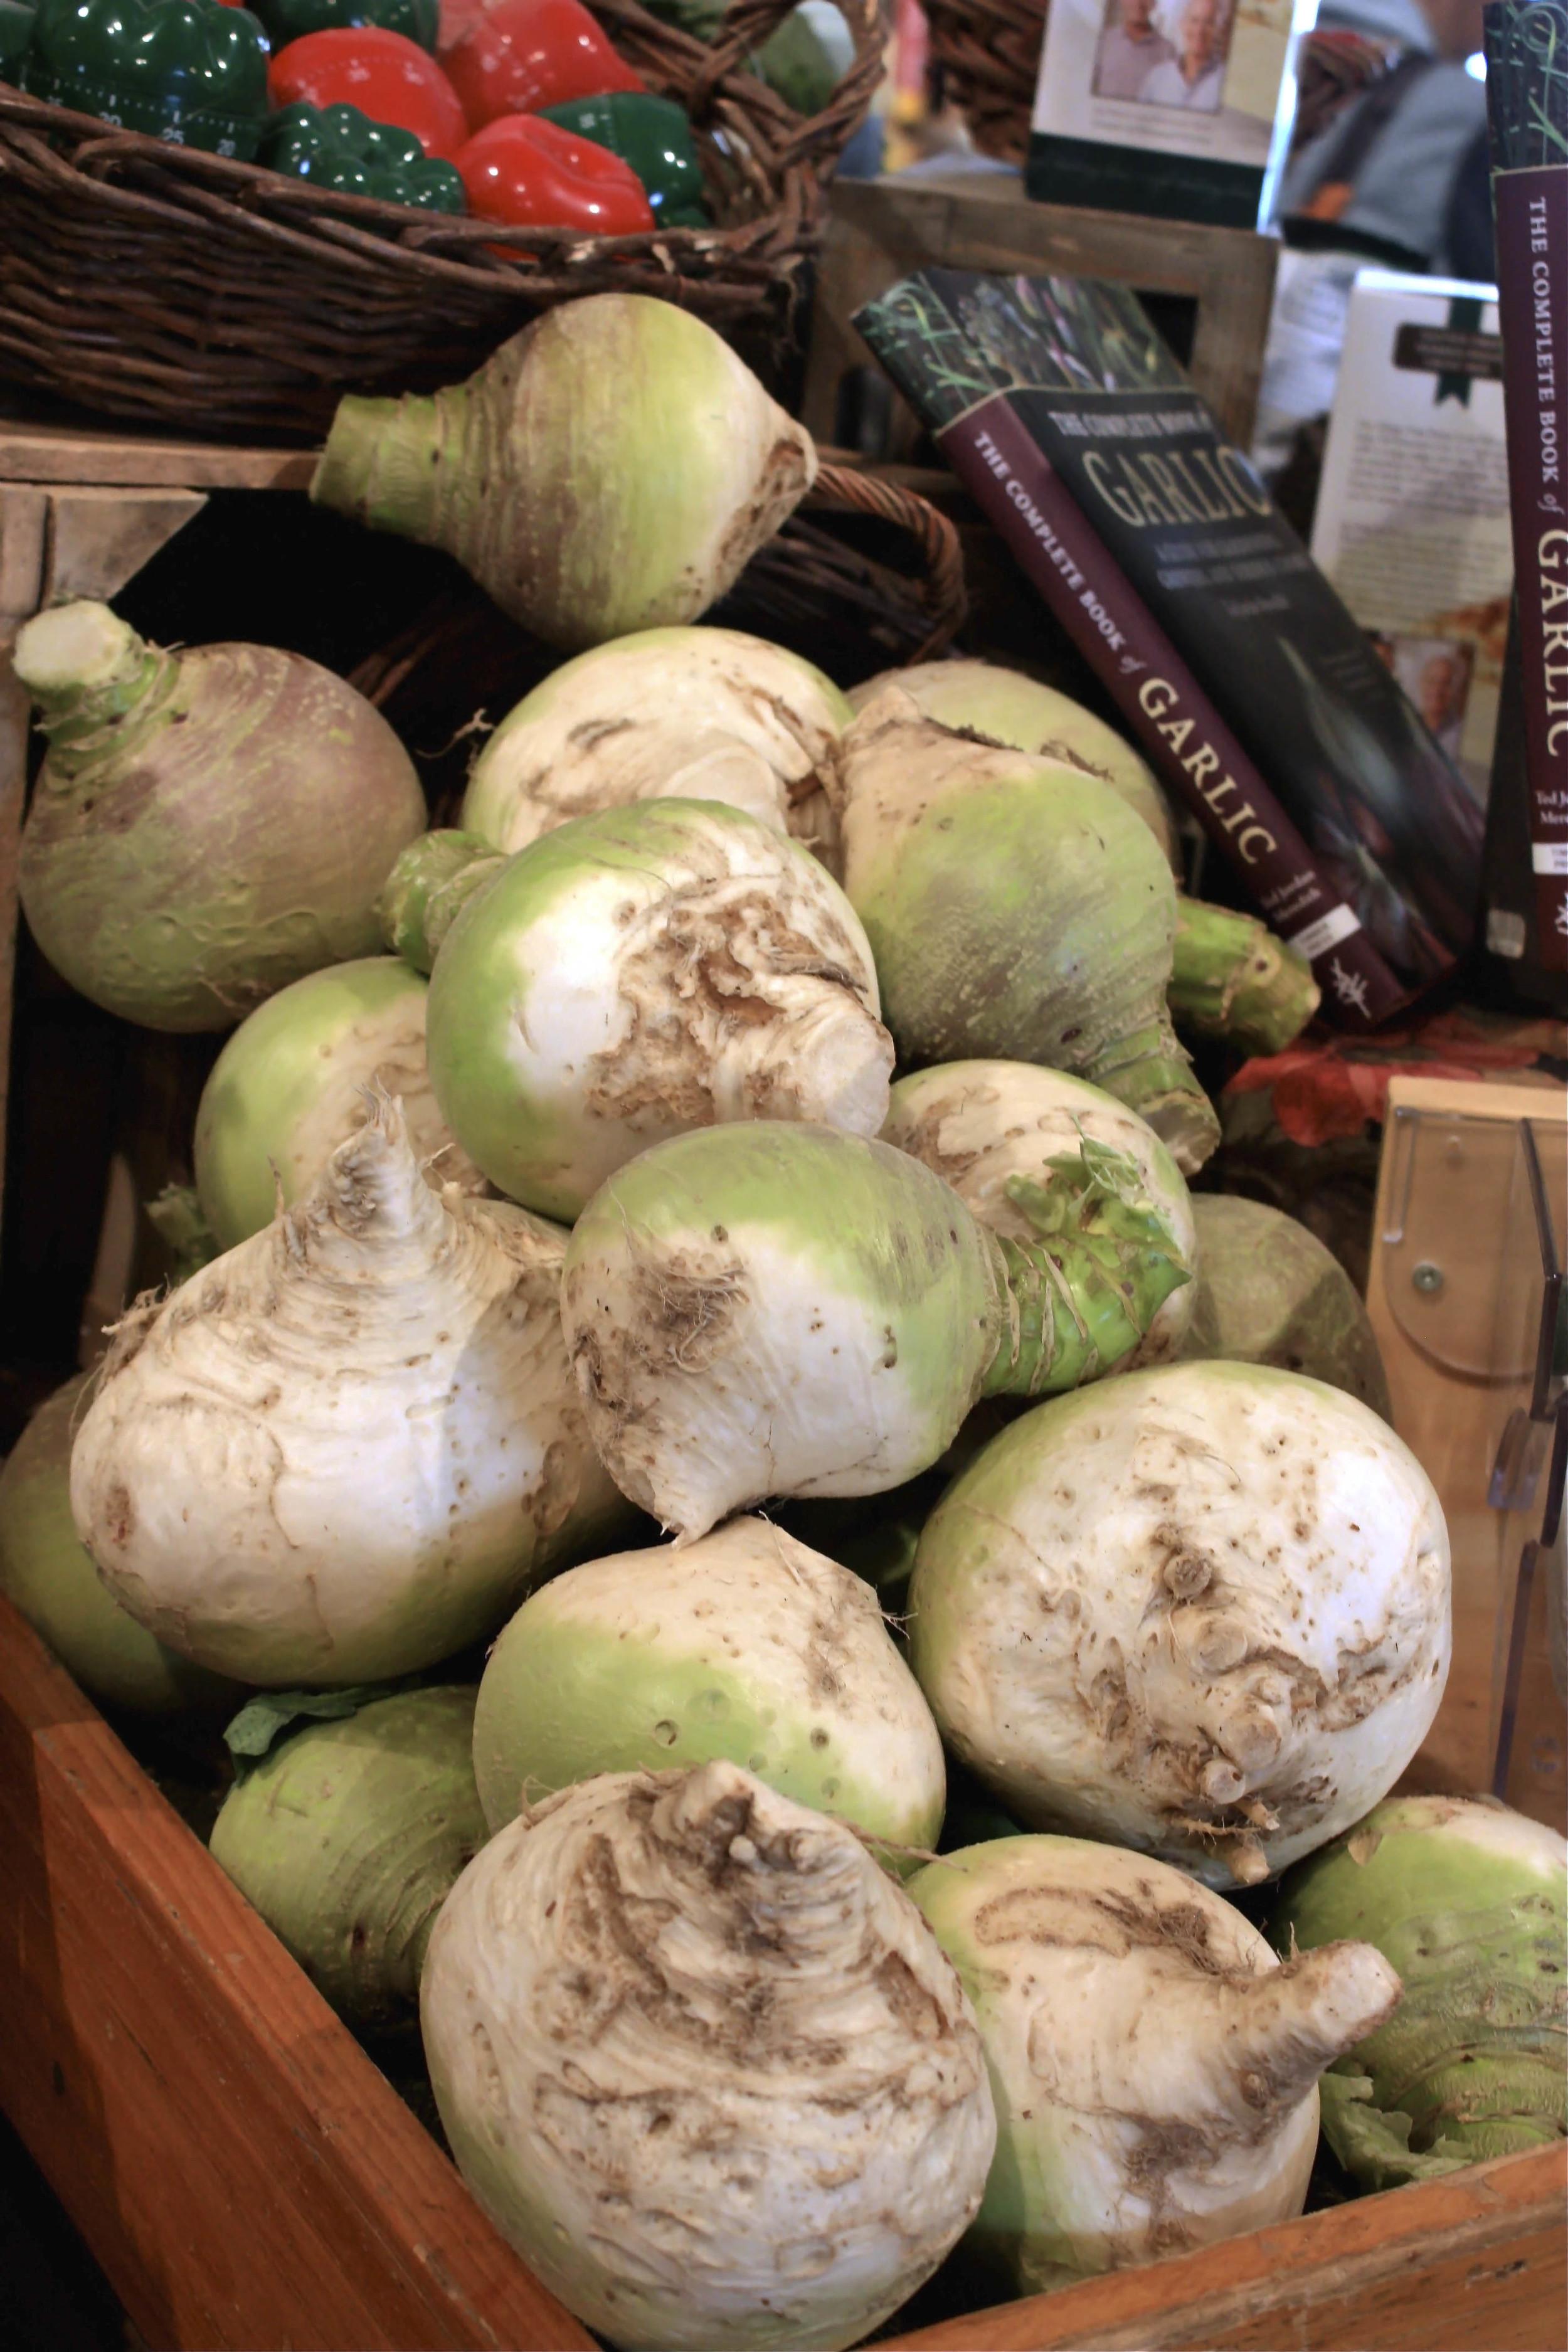 REALLY BIG turnips atSchoharie Valley Farms.